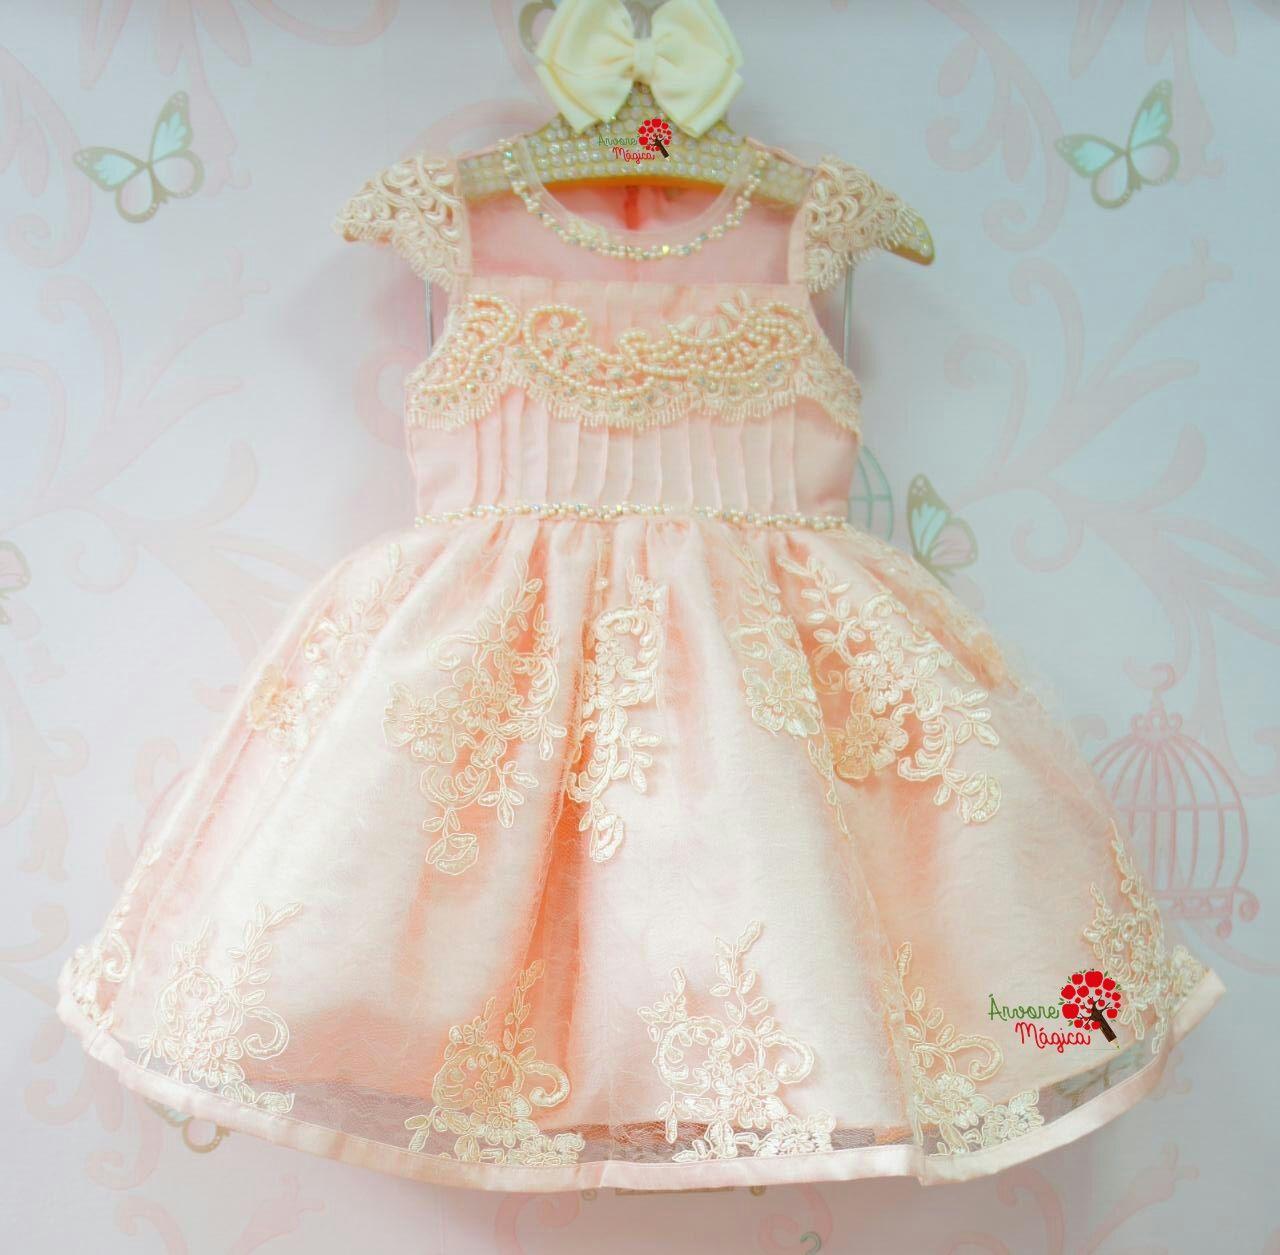 1fdb689f5d3 Vestido de Festa Infantil Bordado Luxo Petit Cherie